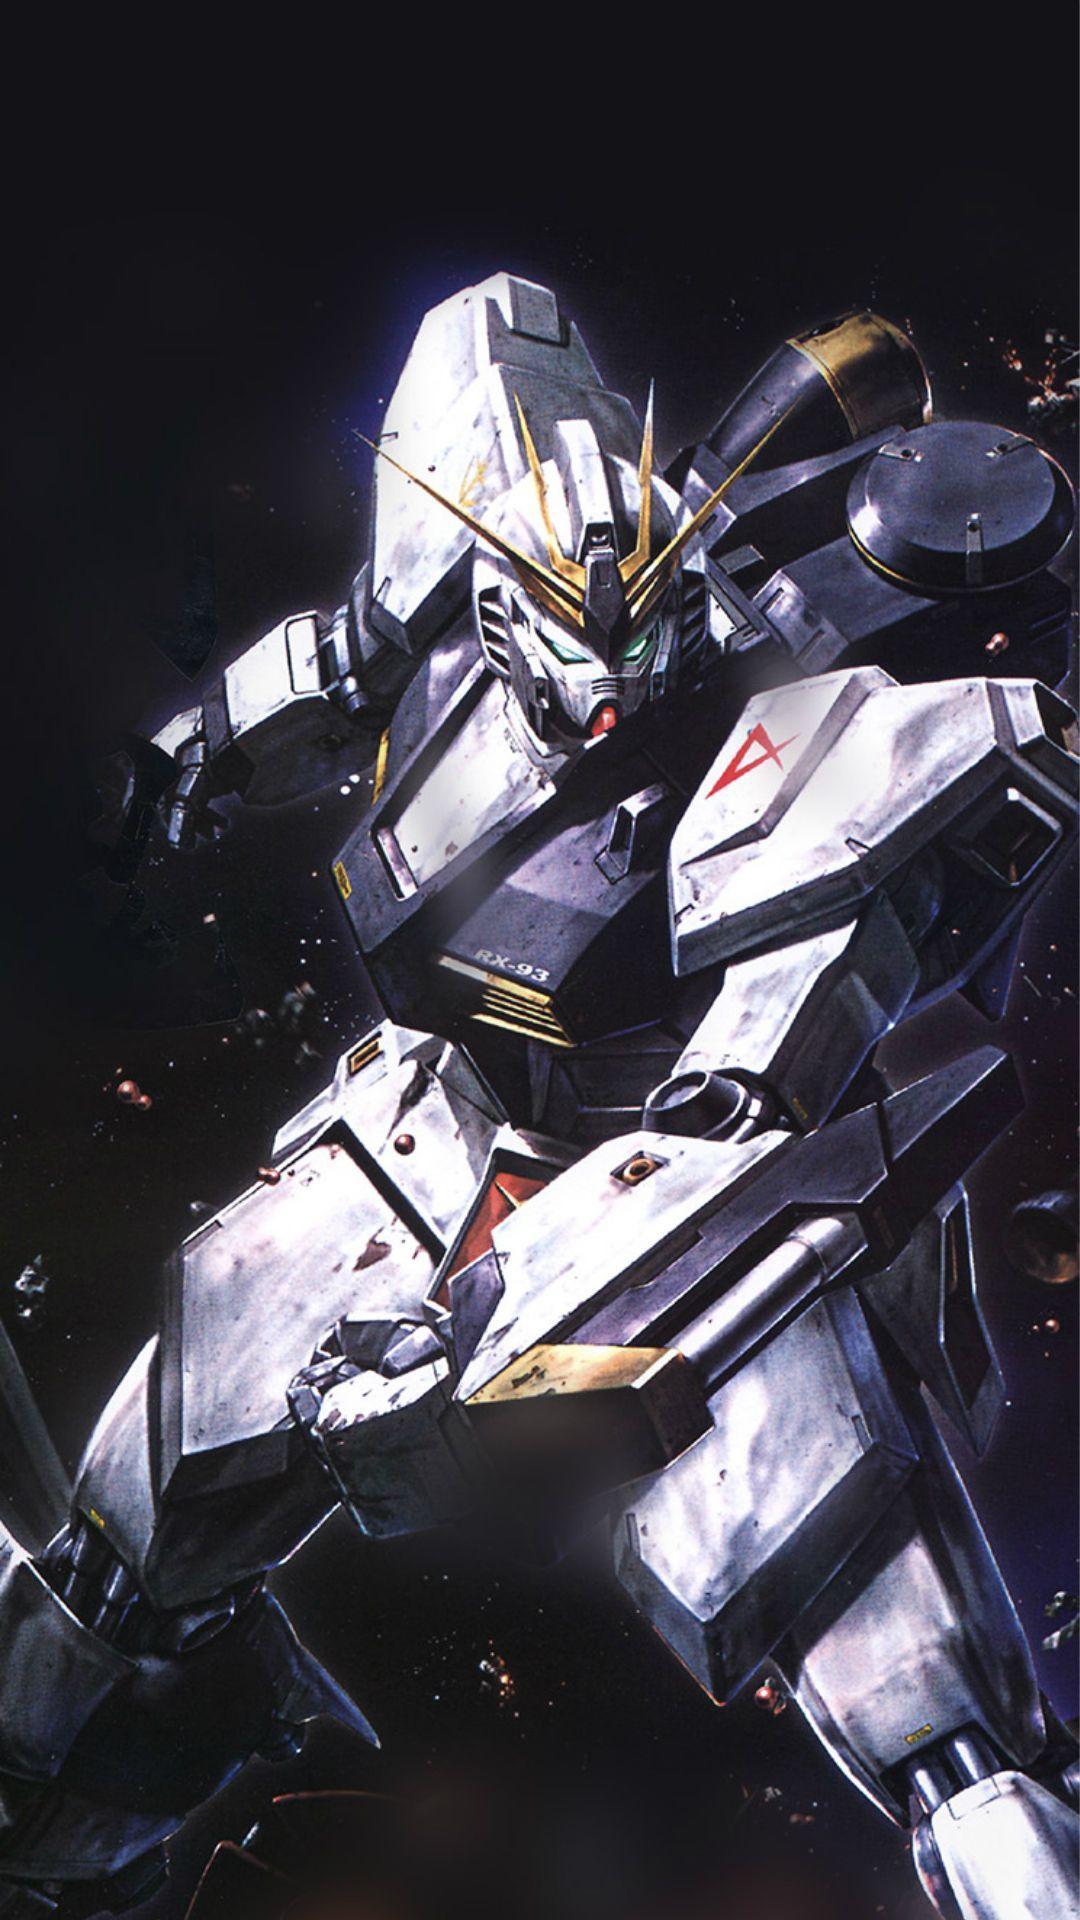 Gundam Iphone Wallpapers Top Free Gundam Iphone